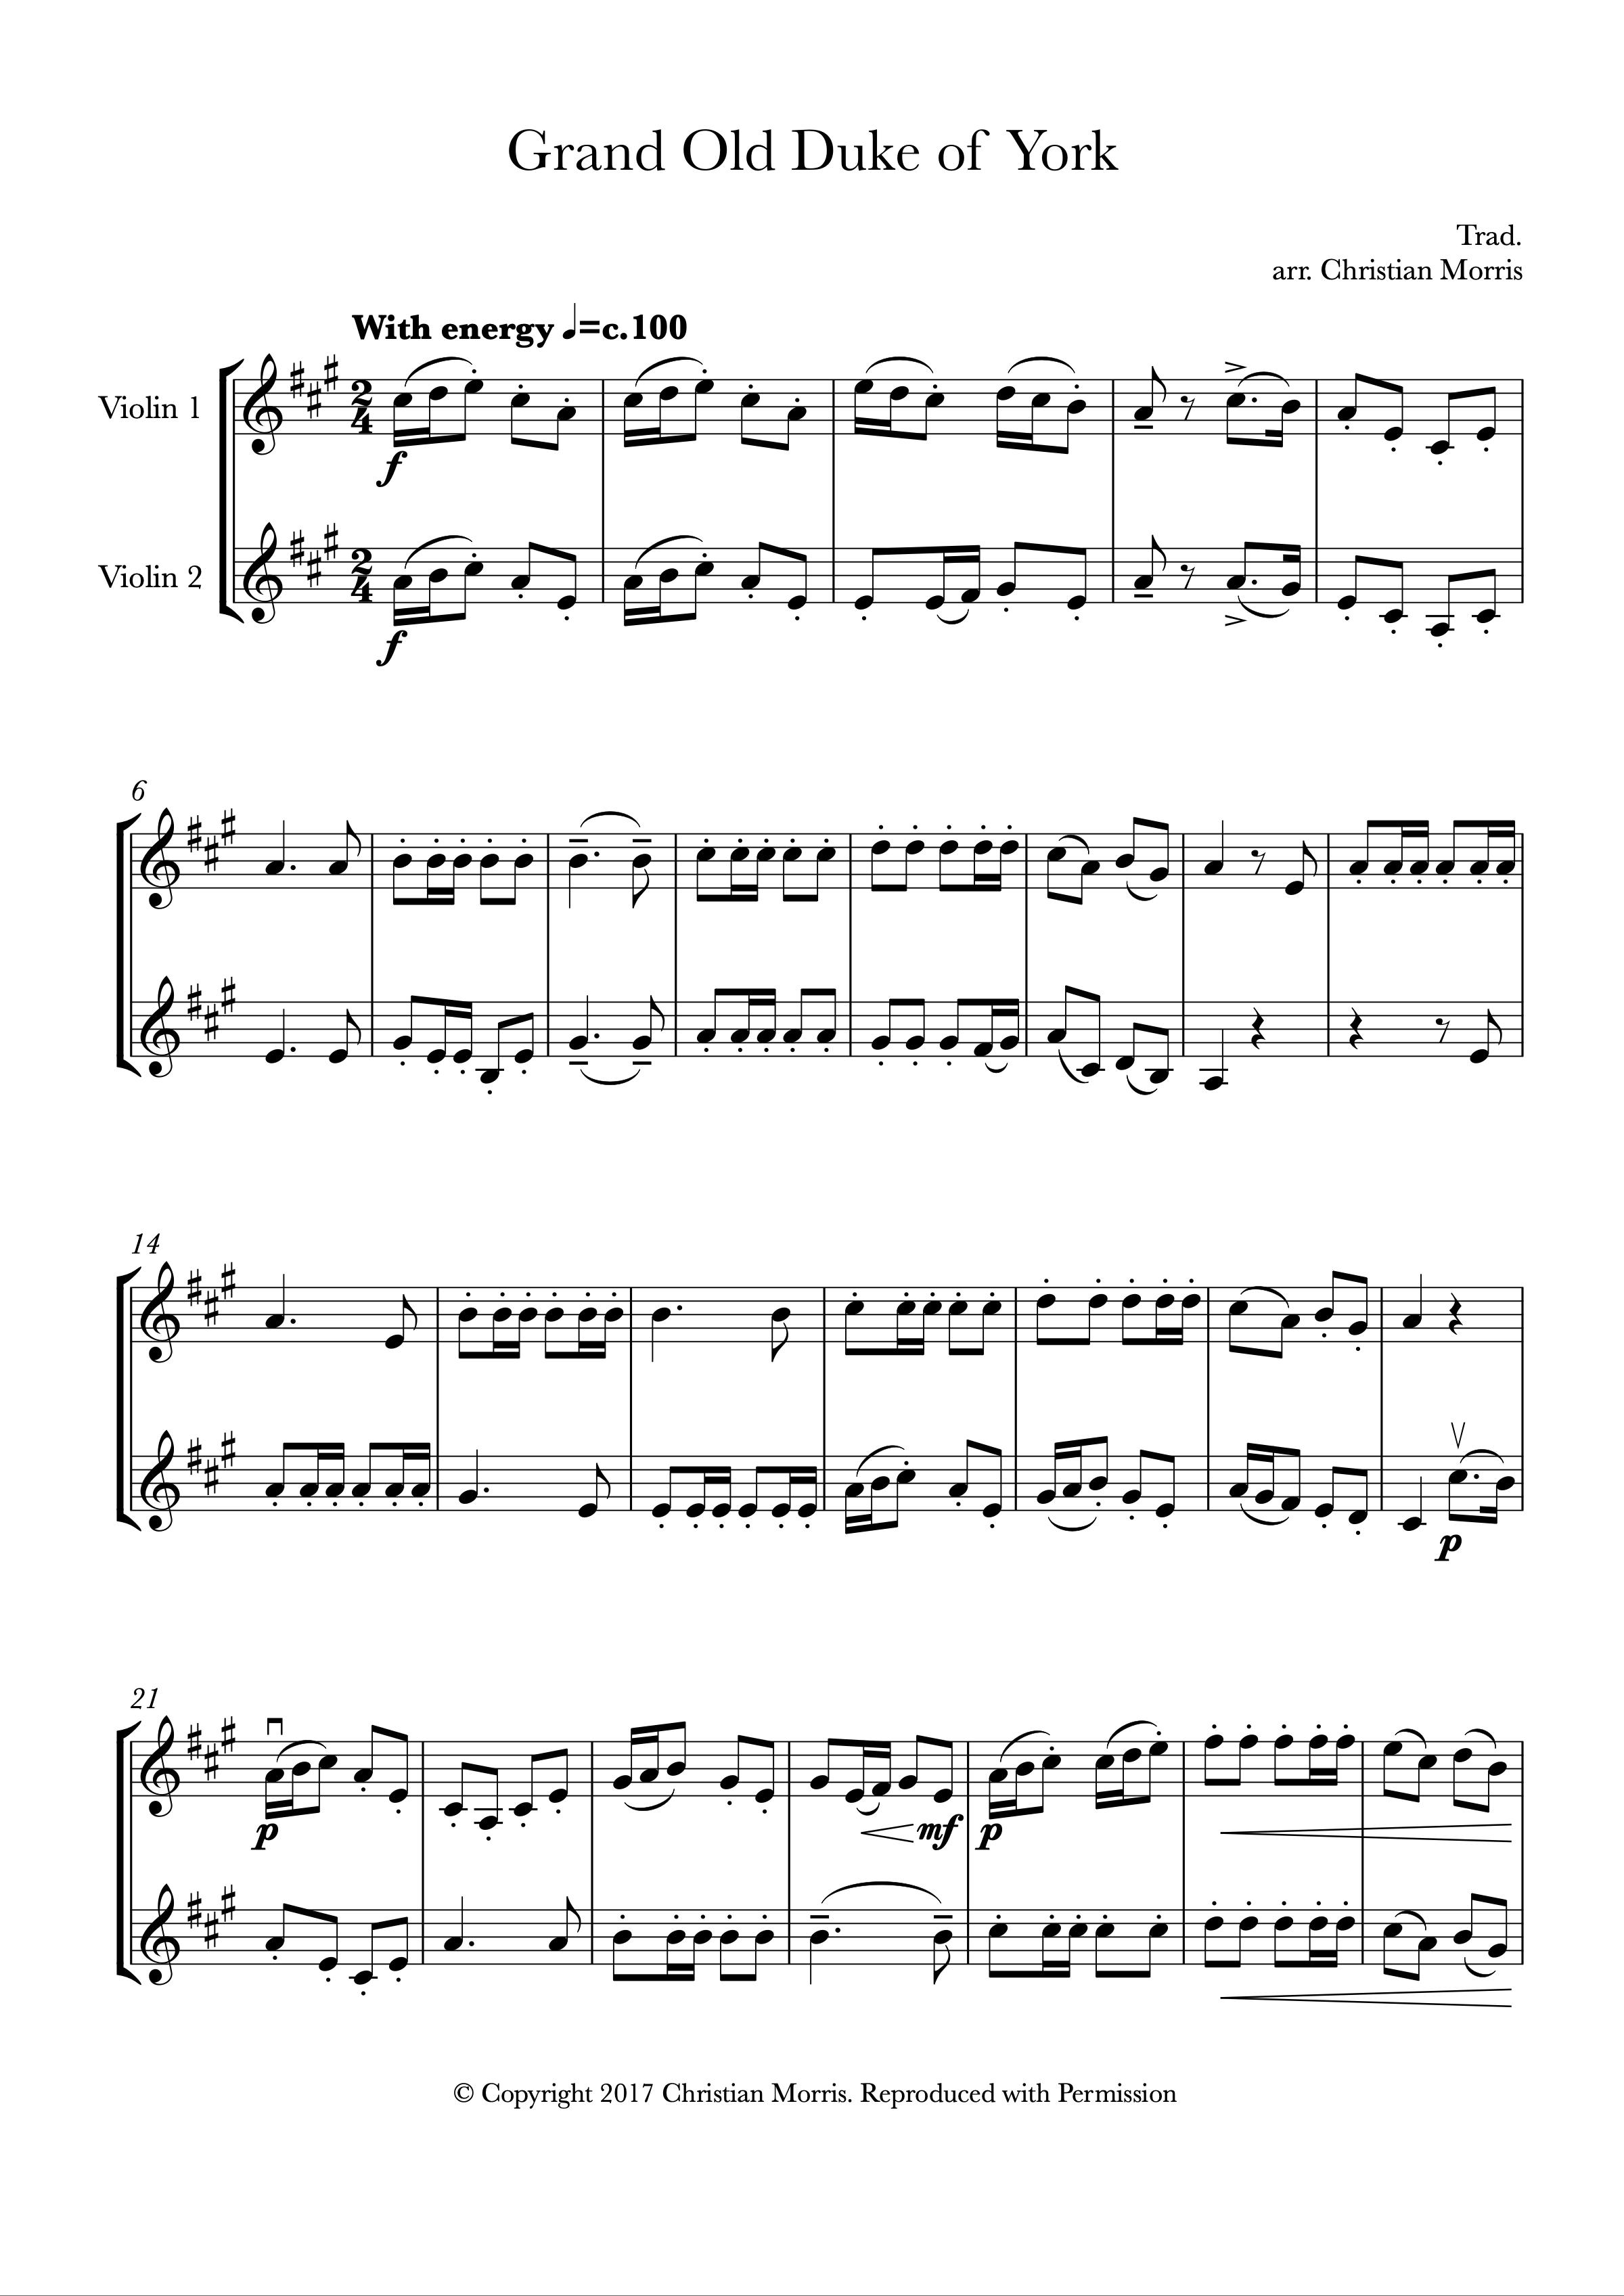 The Grand Old Duke of York (Violin Duet)